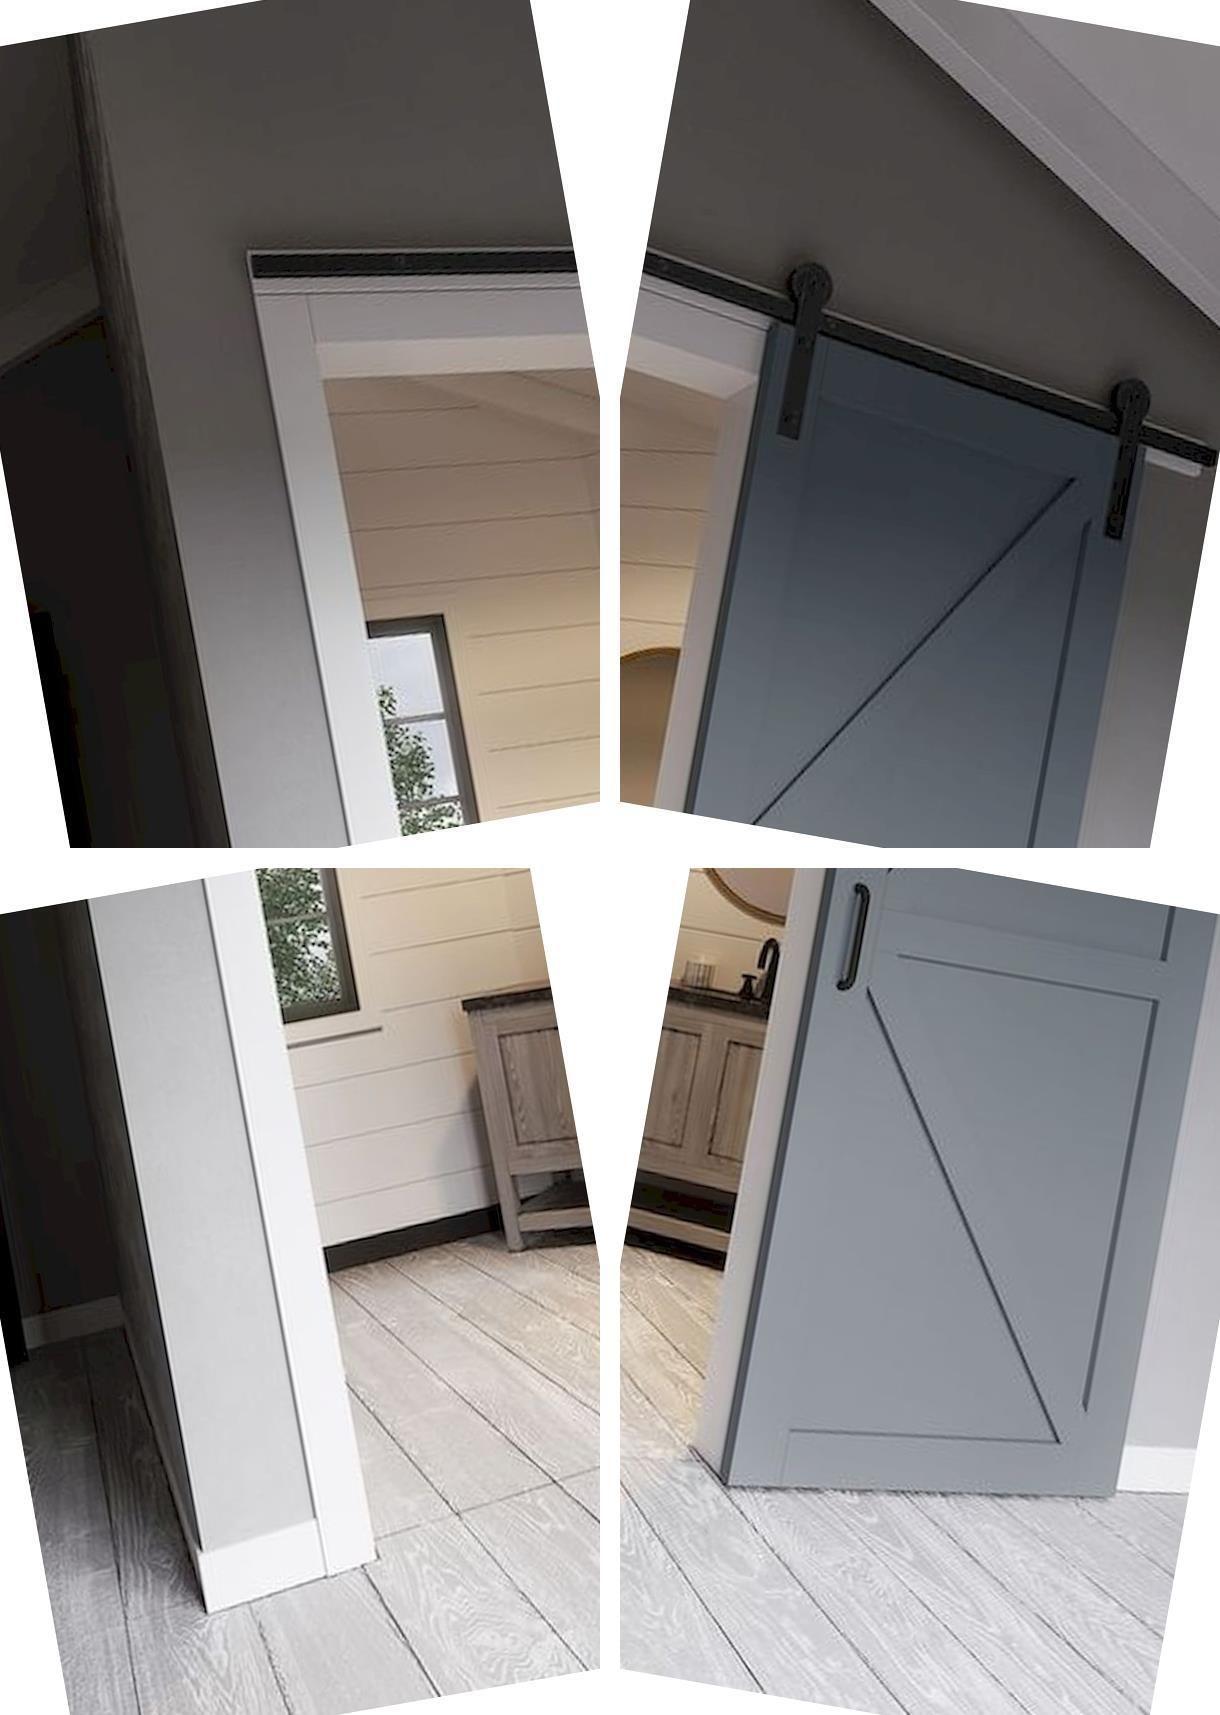 Buy Sliding Barn Door Used Barn Door Hardware For Sale Barn Style Double Doors Interior Barn Doors Sliding Doors Interior Glass Barn Doors Interior